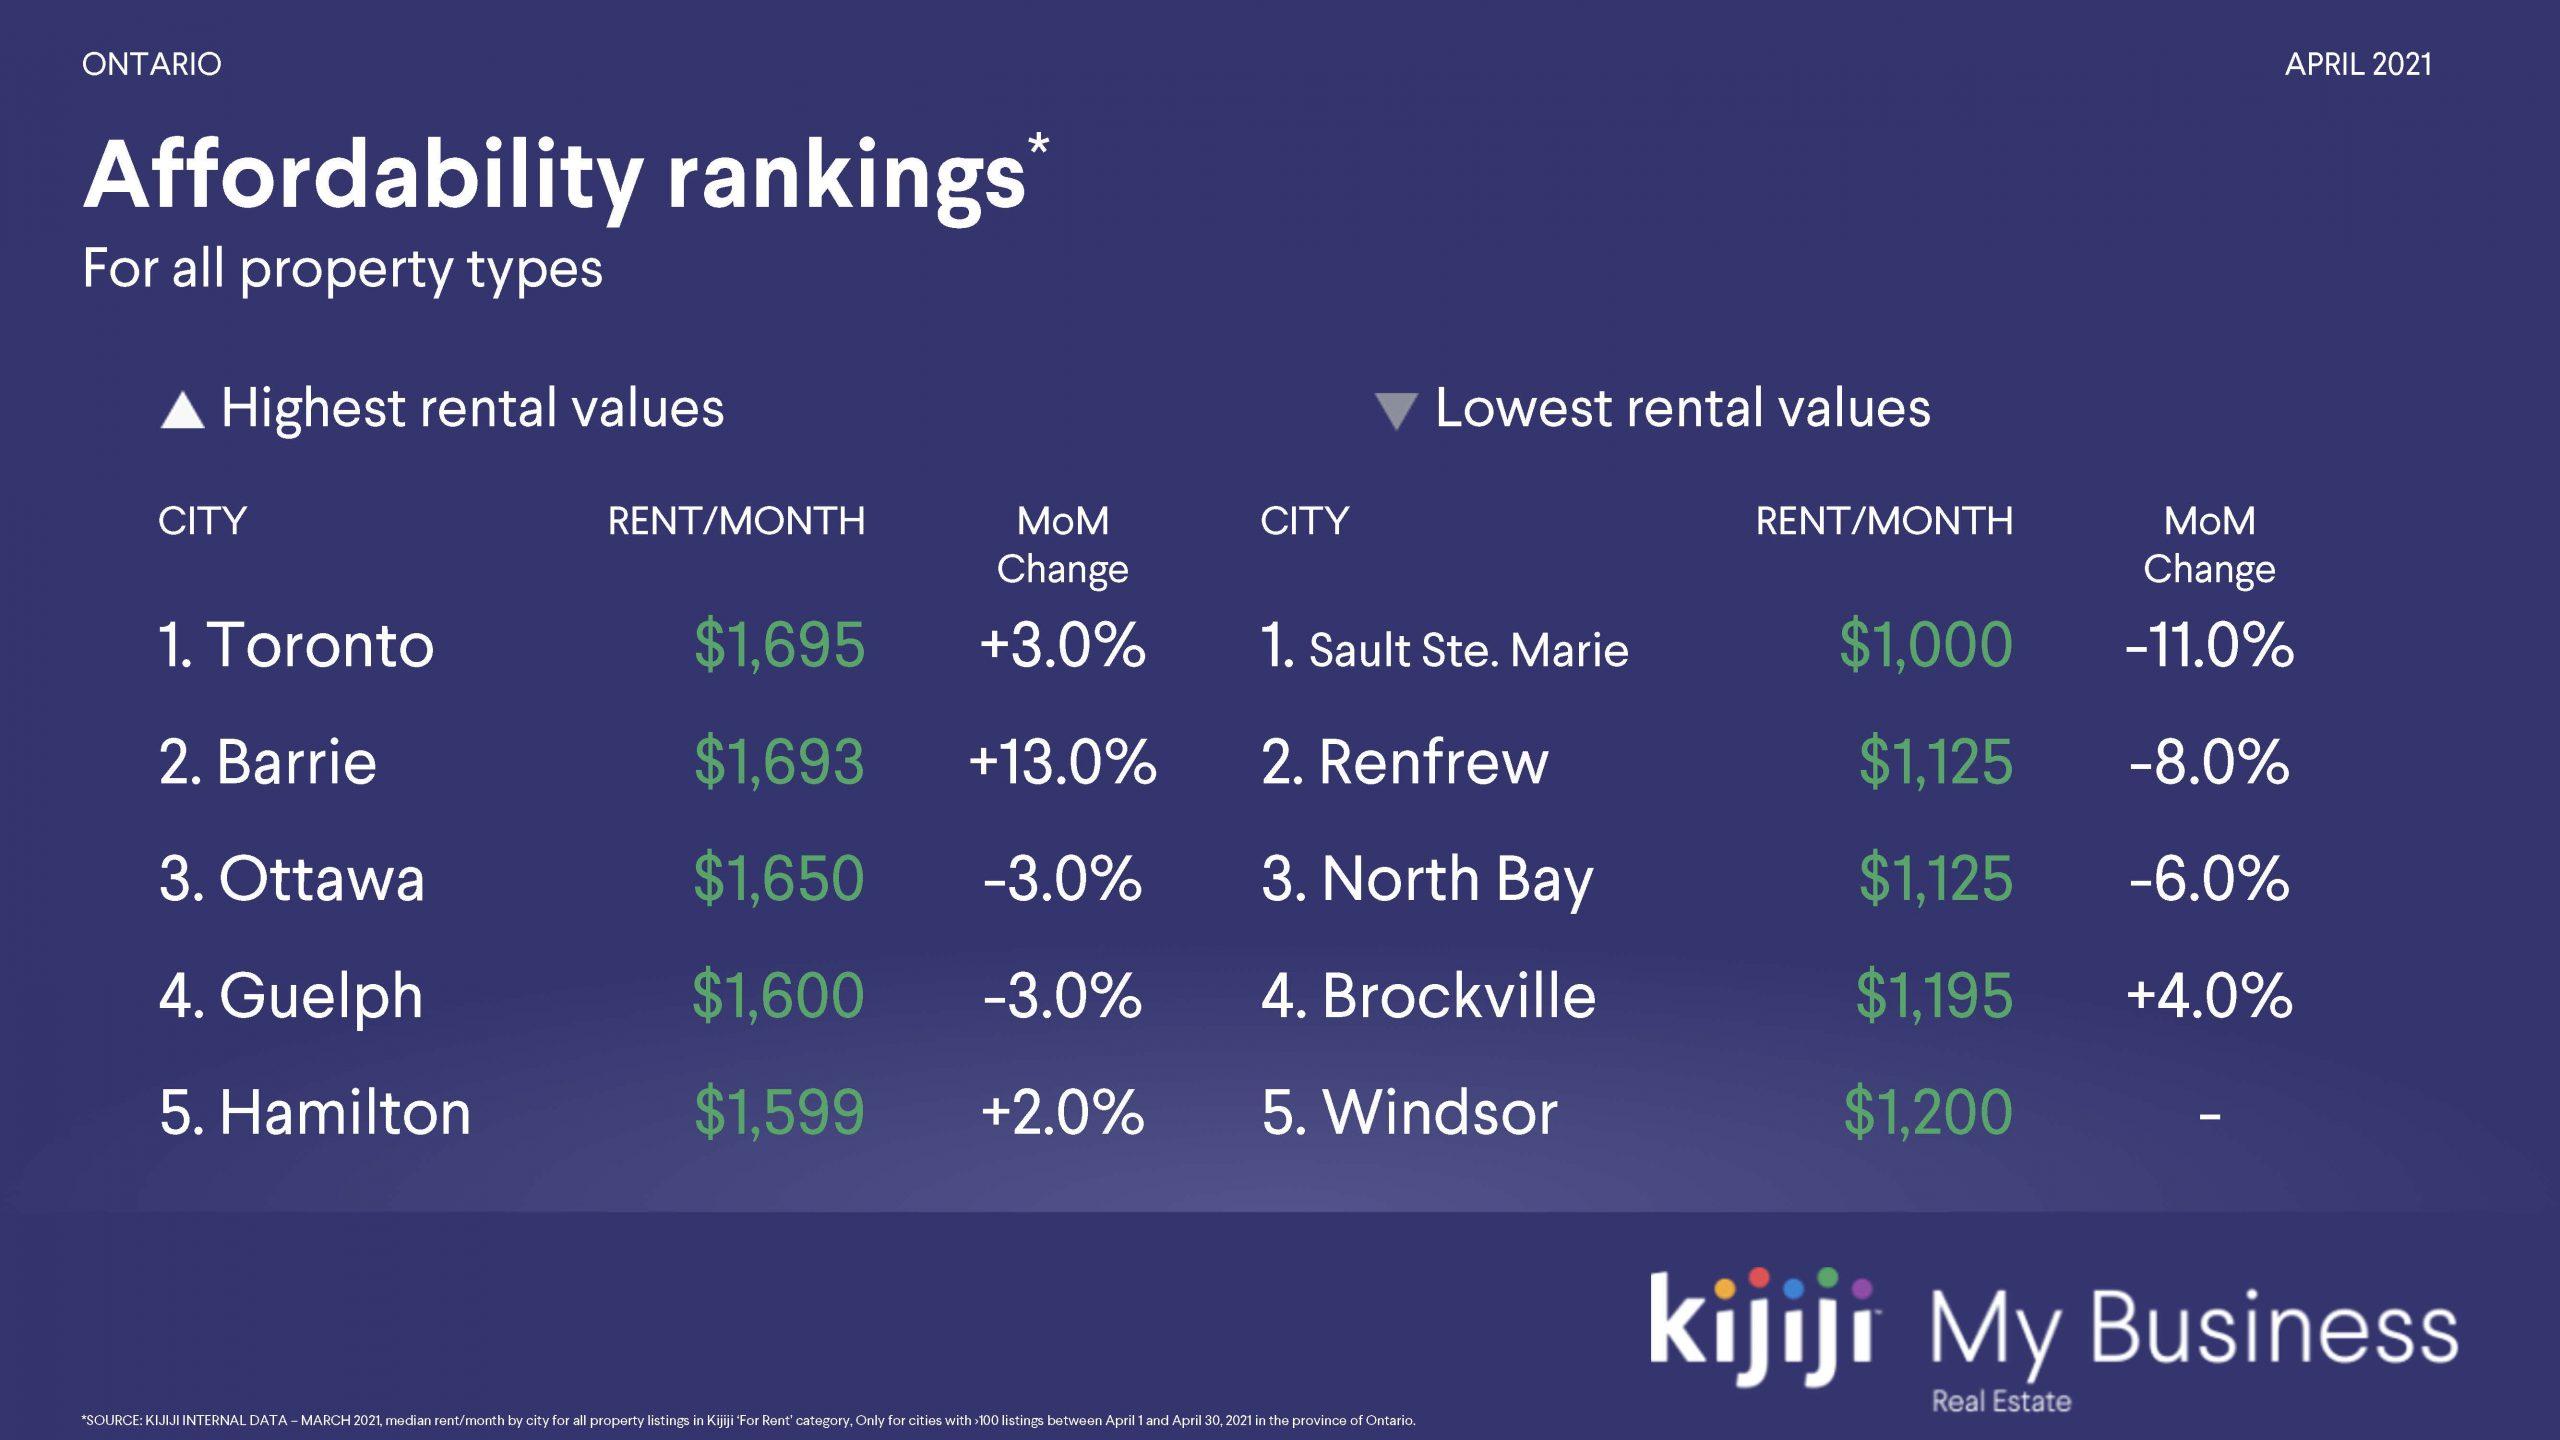 Kijiji Rentals Ontario - Affordability Rankings April 2021